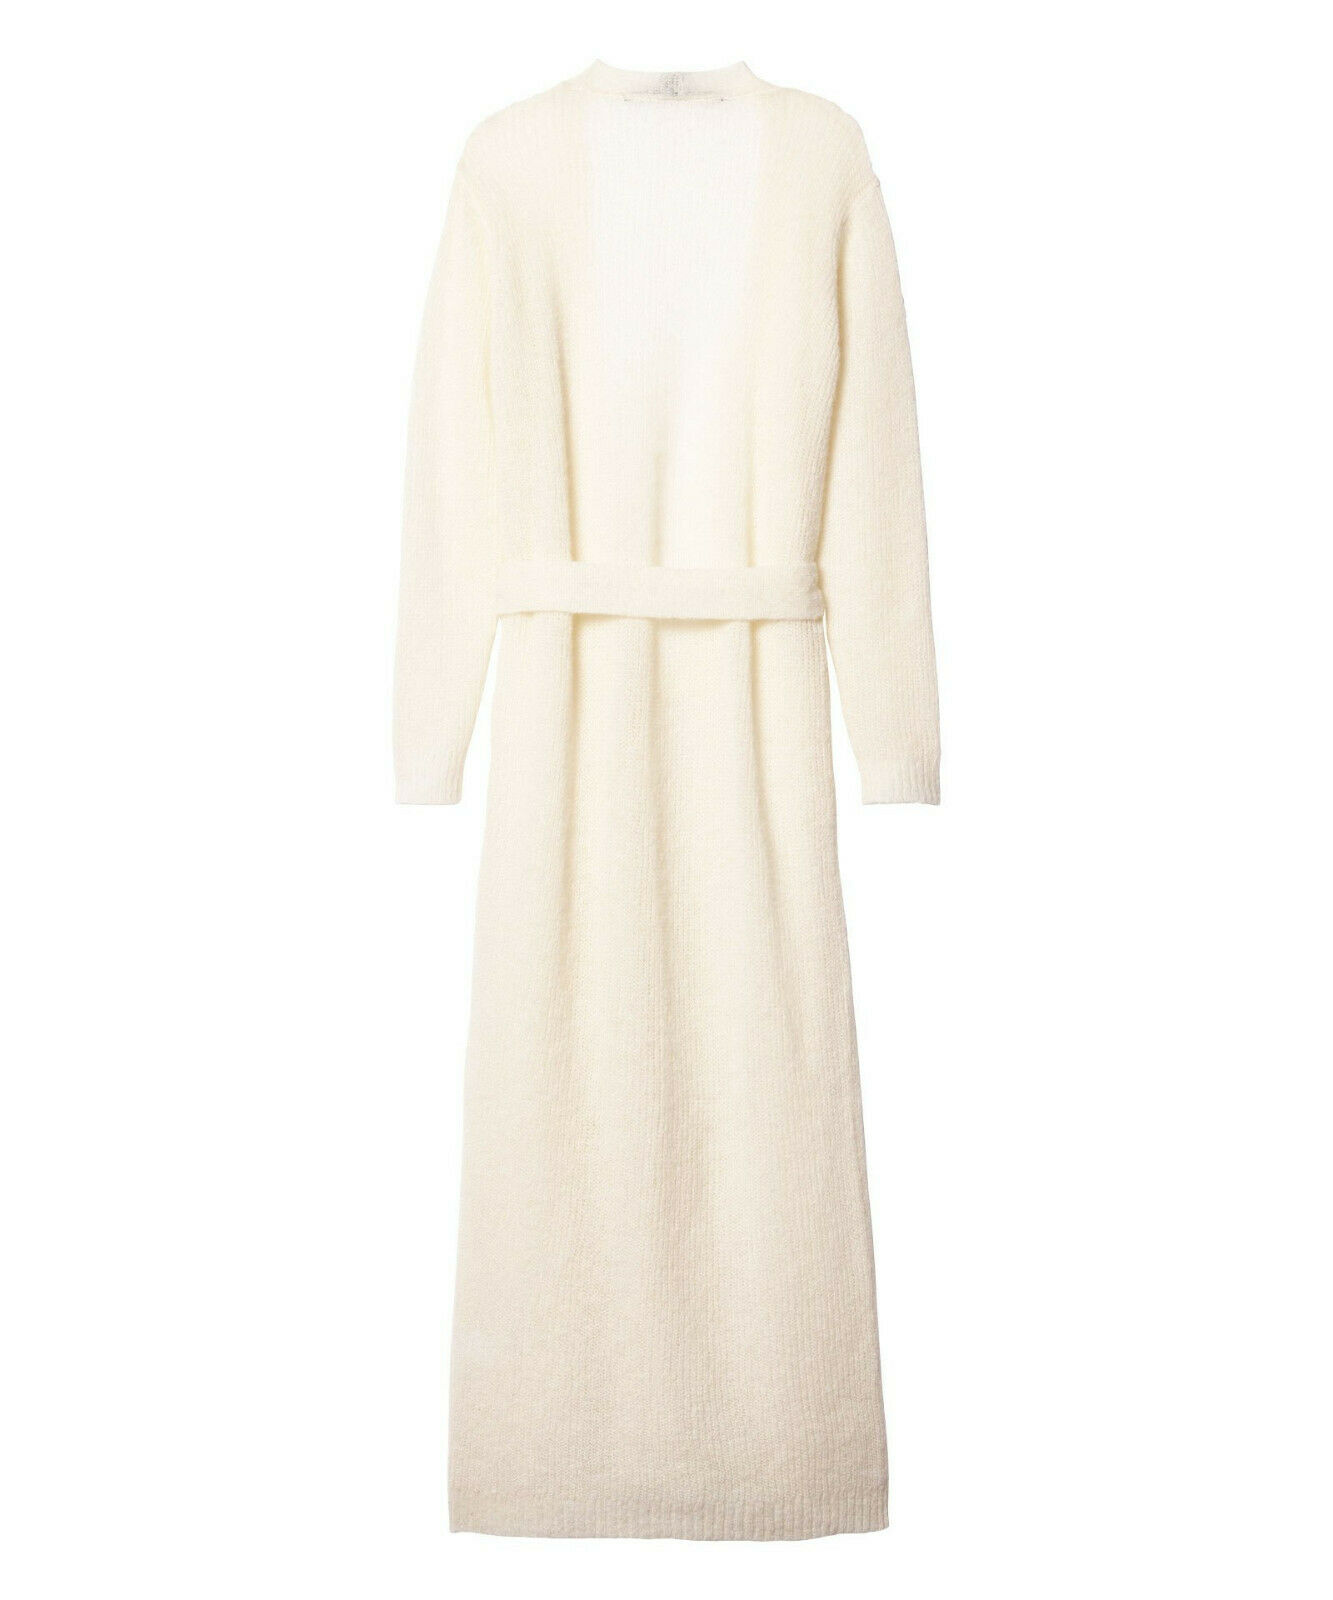 10DAYS Amsterdam Couture de  la Luz Chaqueta Punto Merino Lana New Chapter 6  la calidad primero los consumidores primero